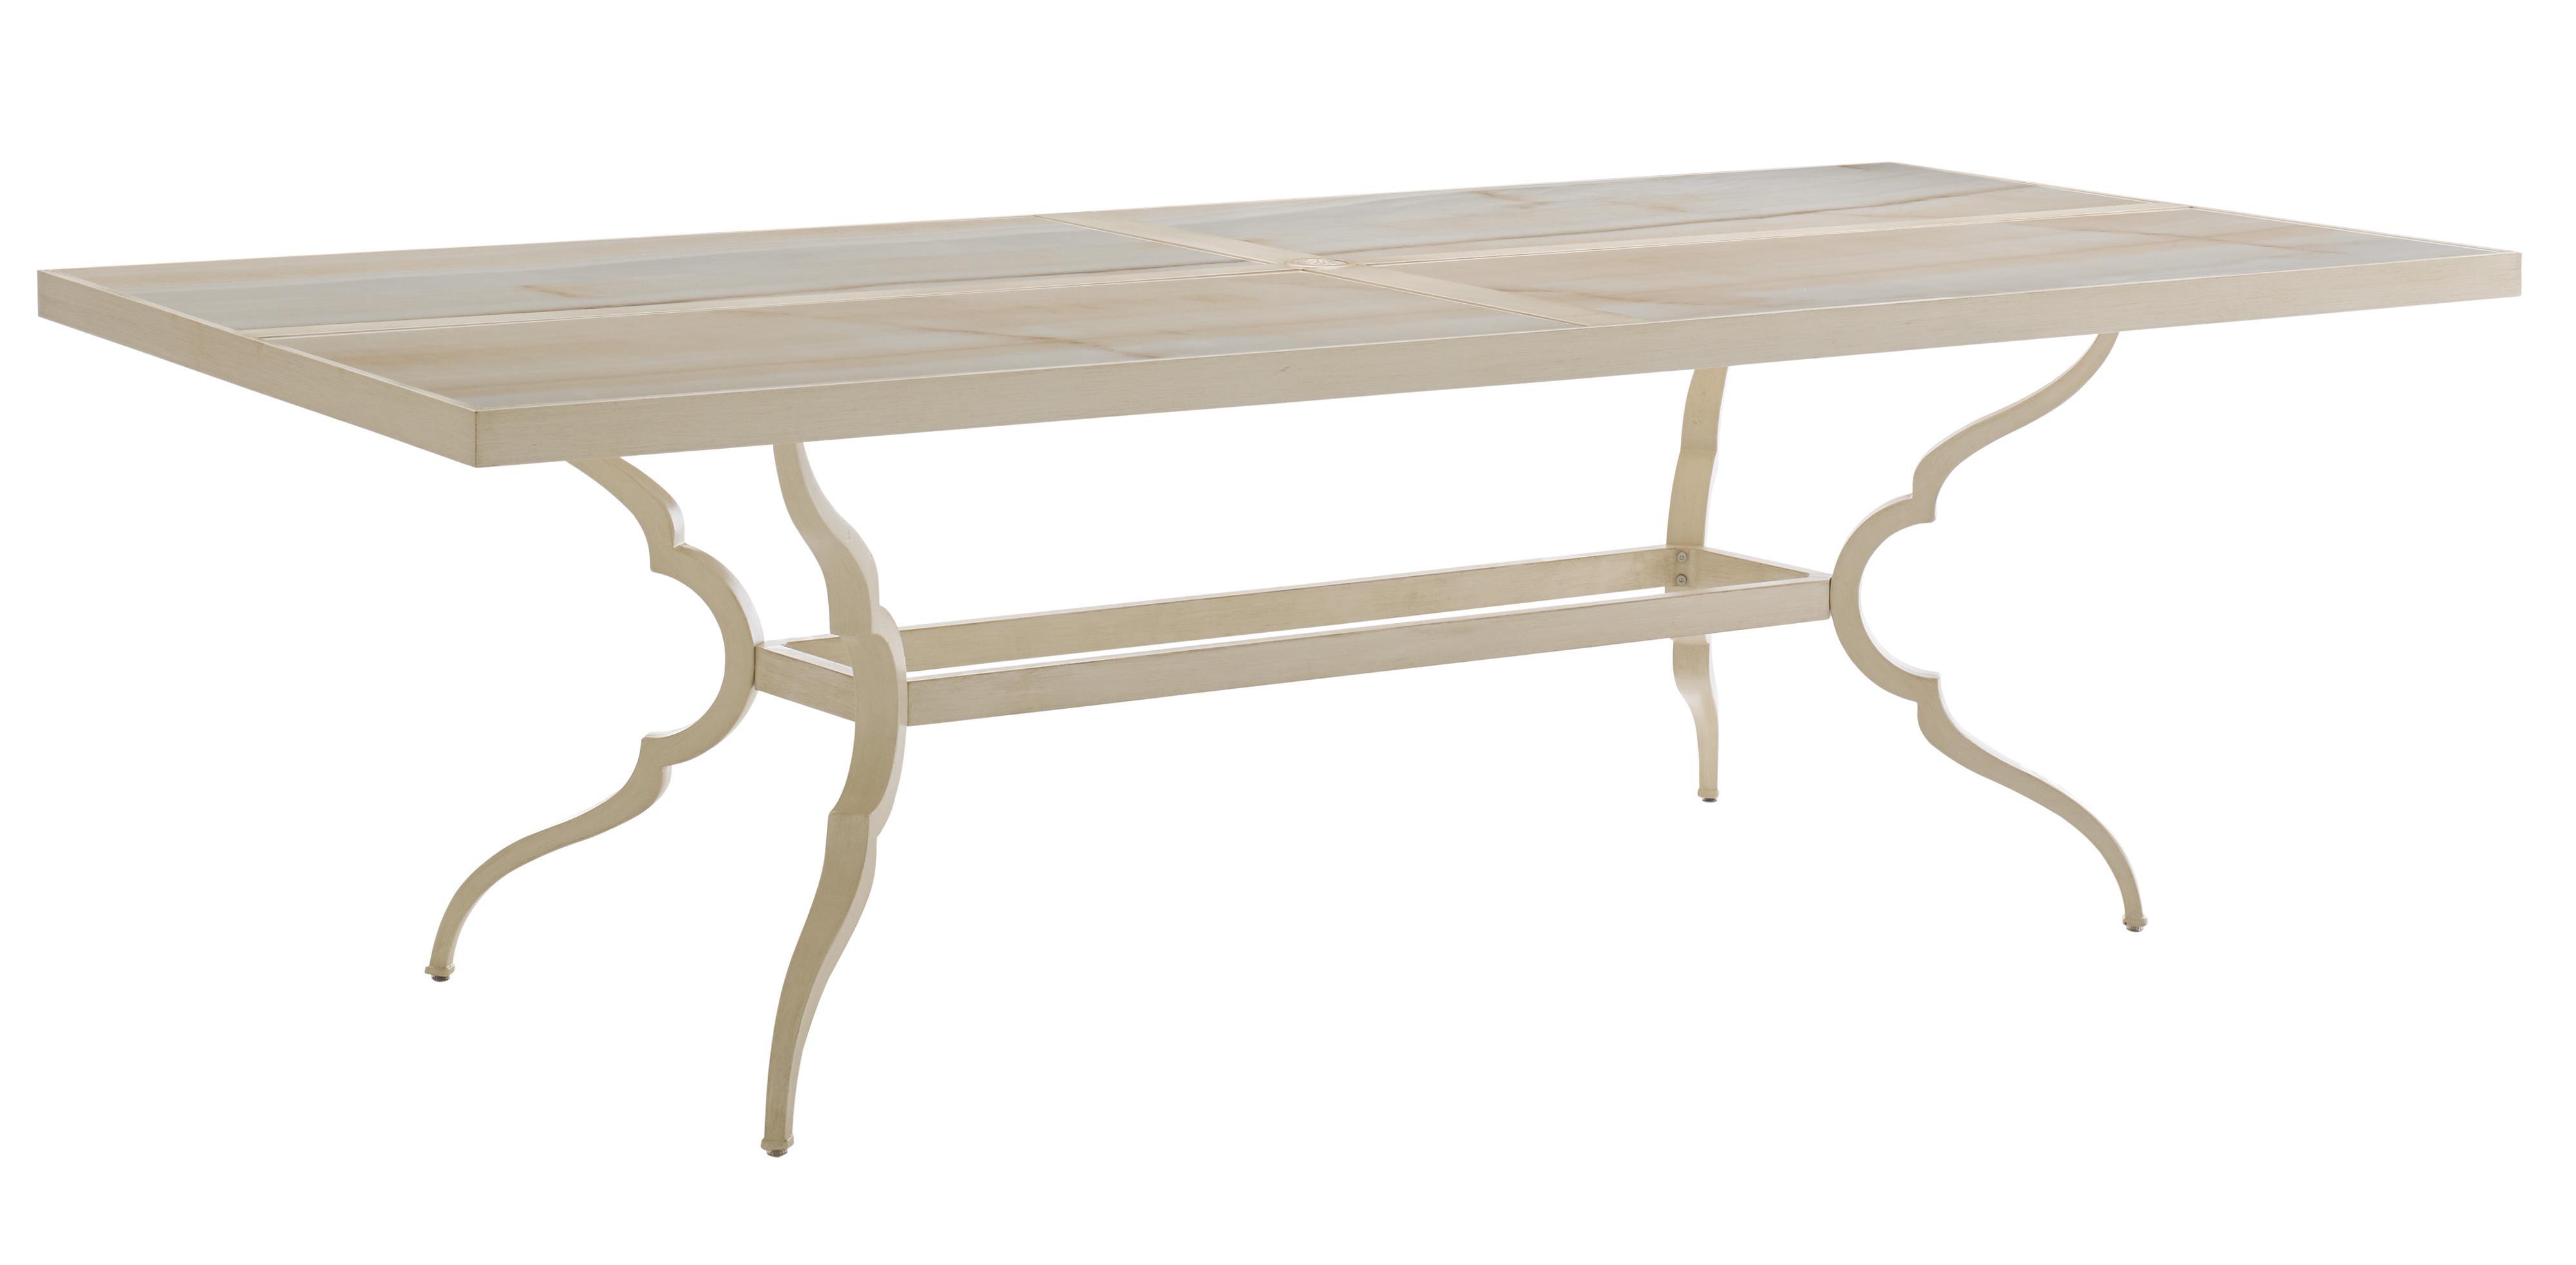 Rectangular Dining Table w/ Porcelain Top